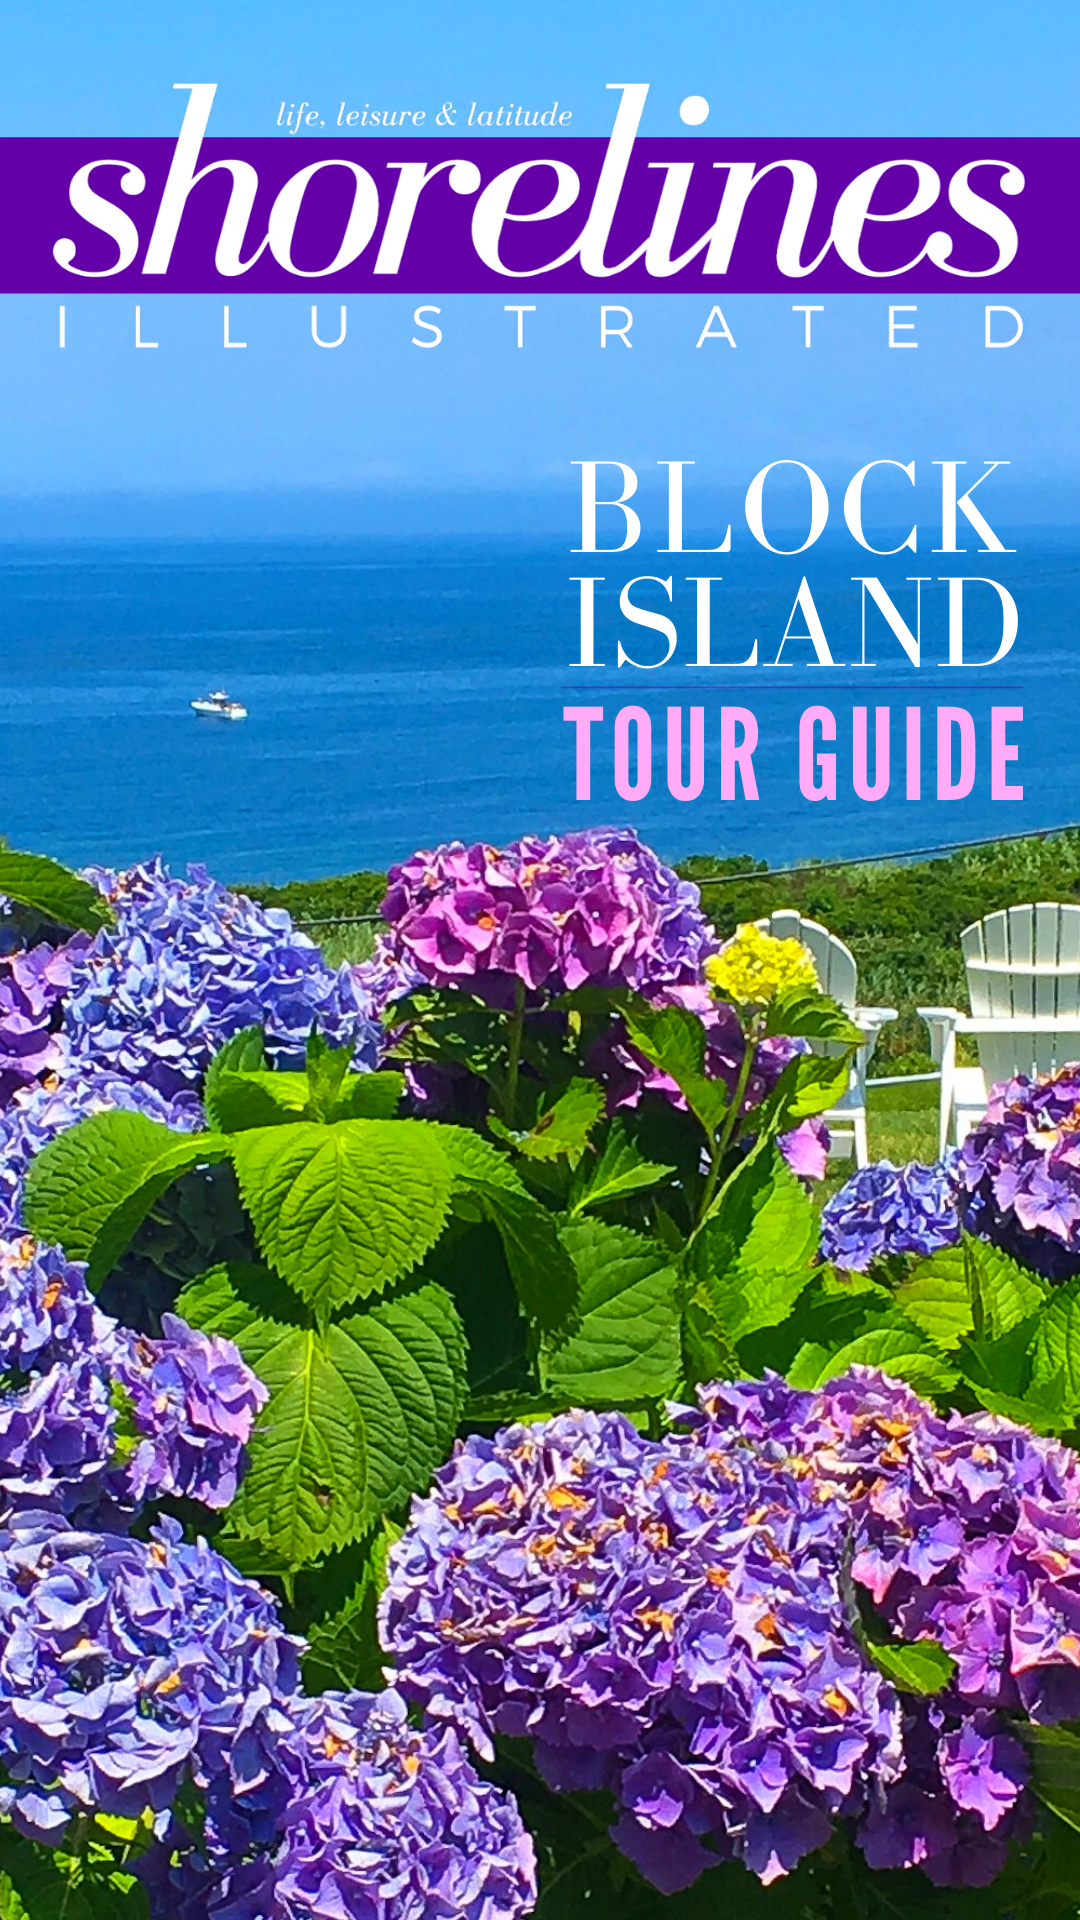 Block Island Tour Guide-1